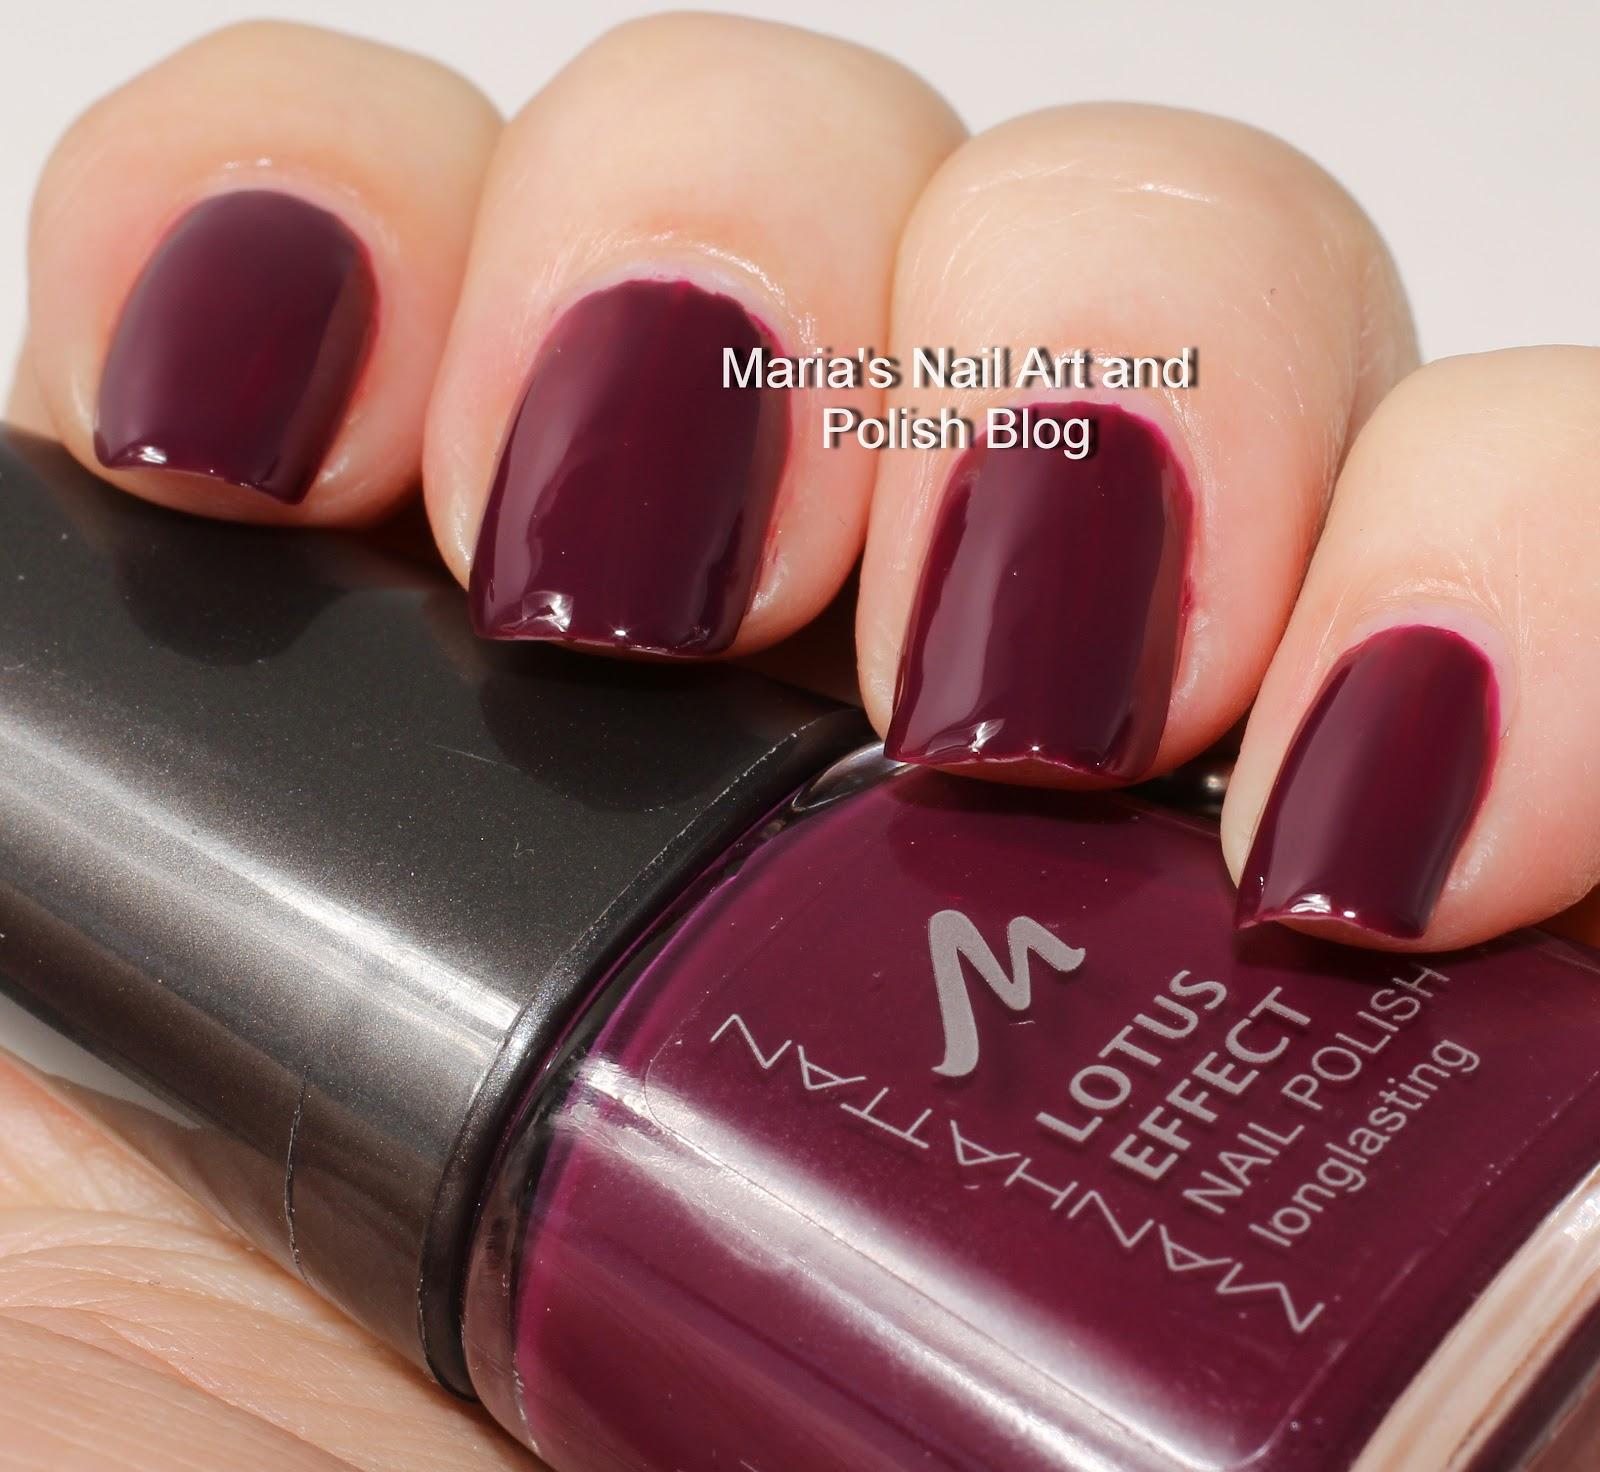 Marias Nail Art And Polish Blog Flushed With Stripes And: Marias Nail Art And Polish Blog